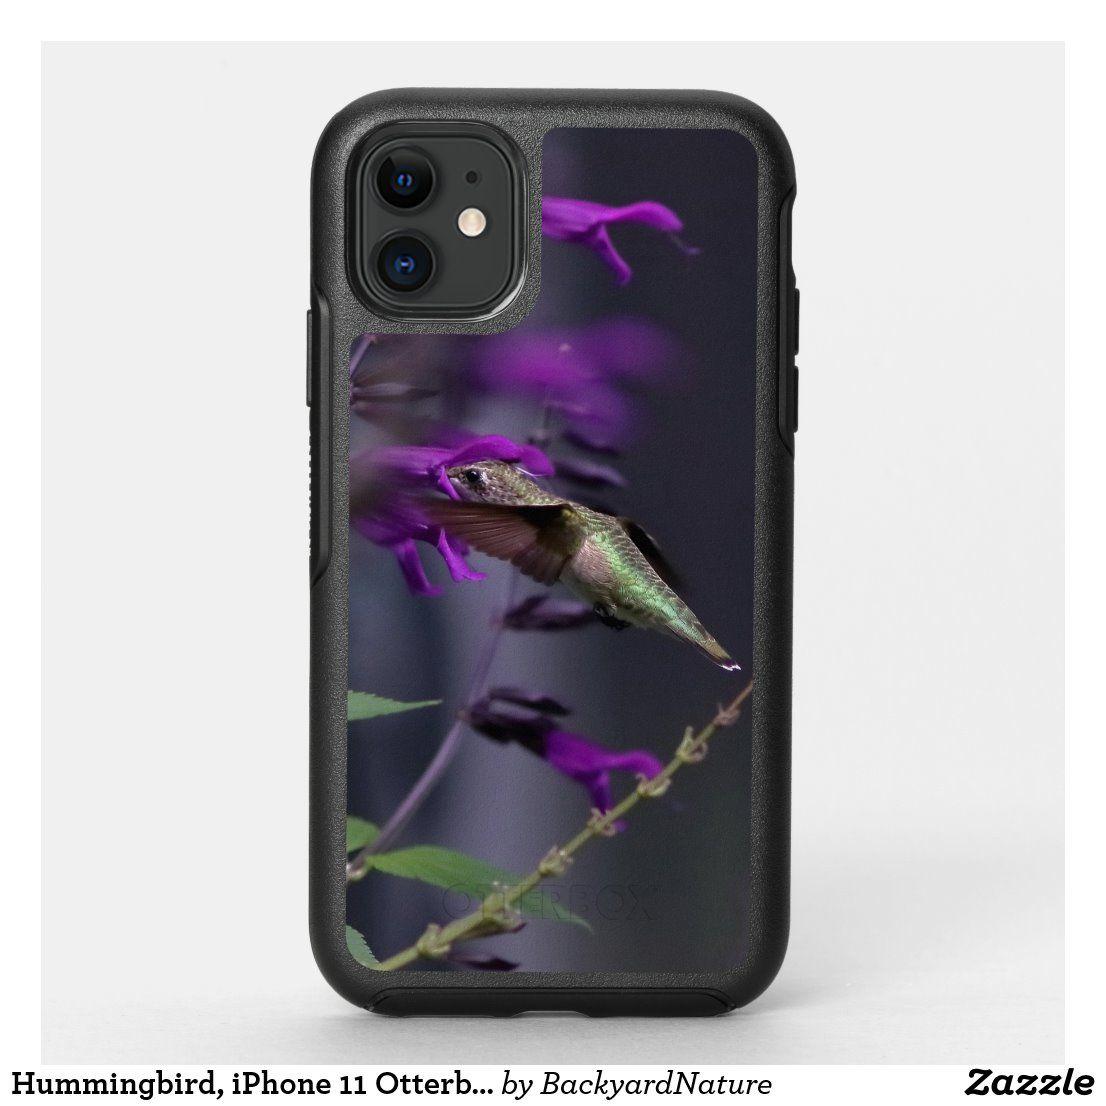 Hummingbird iphone 11 otterbox iphone